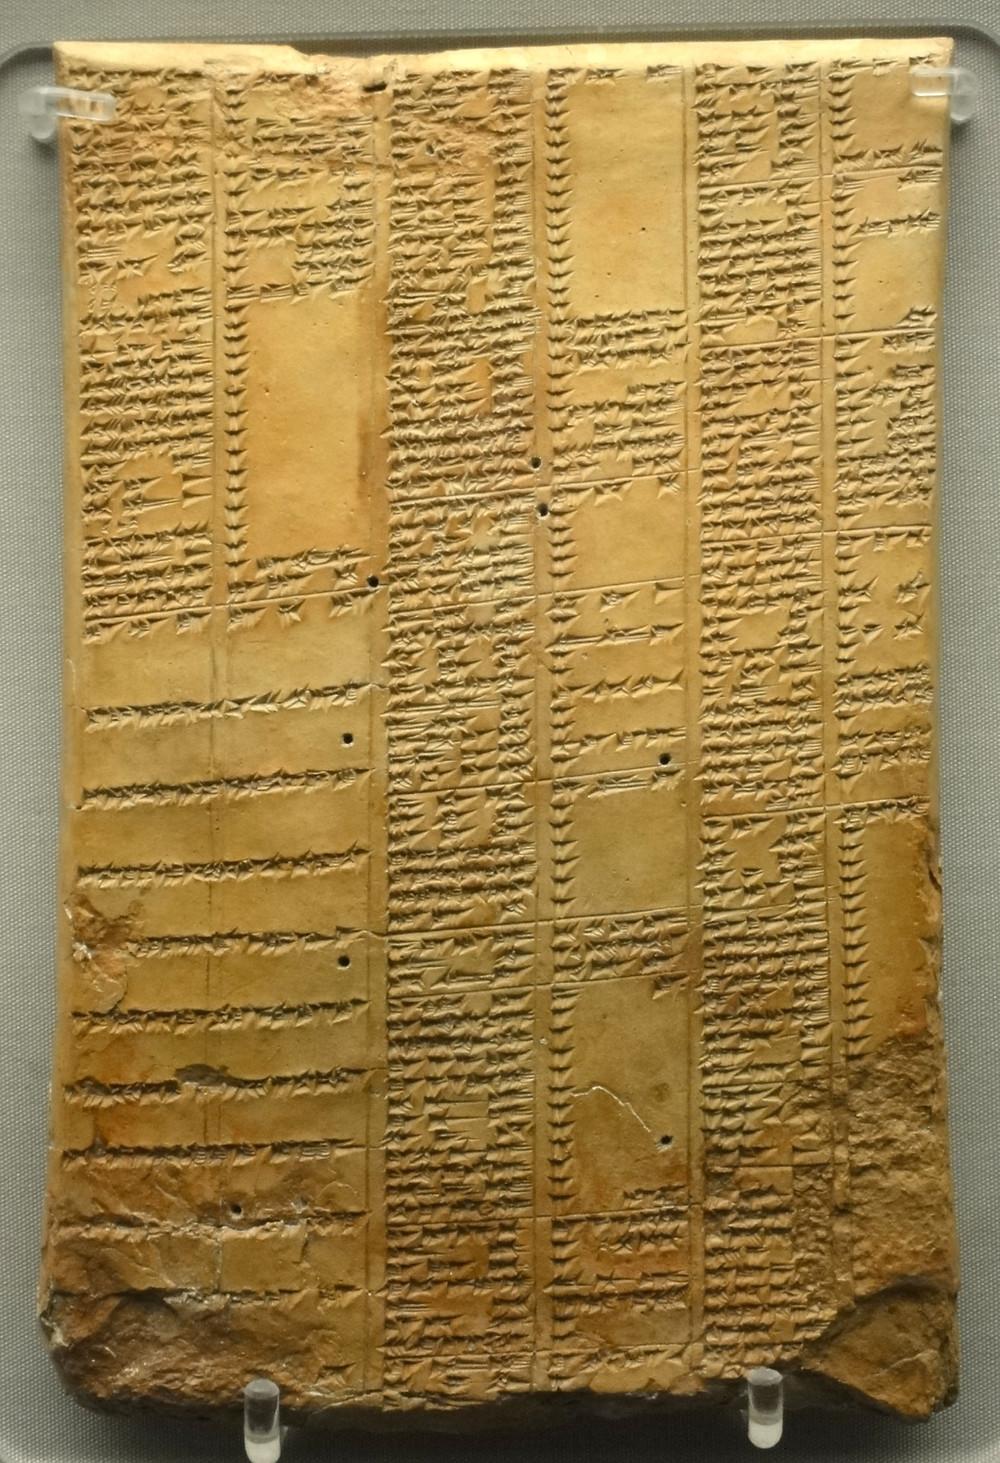 Library_of_Ashurbanipal_synonym_list_tablet.jpg